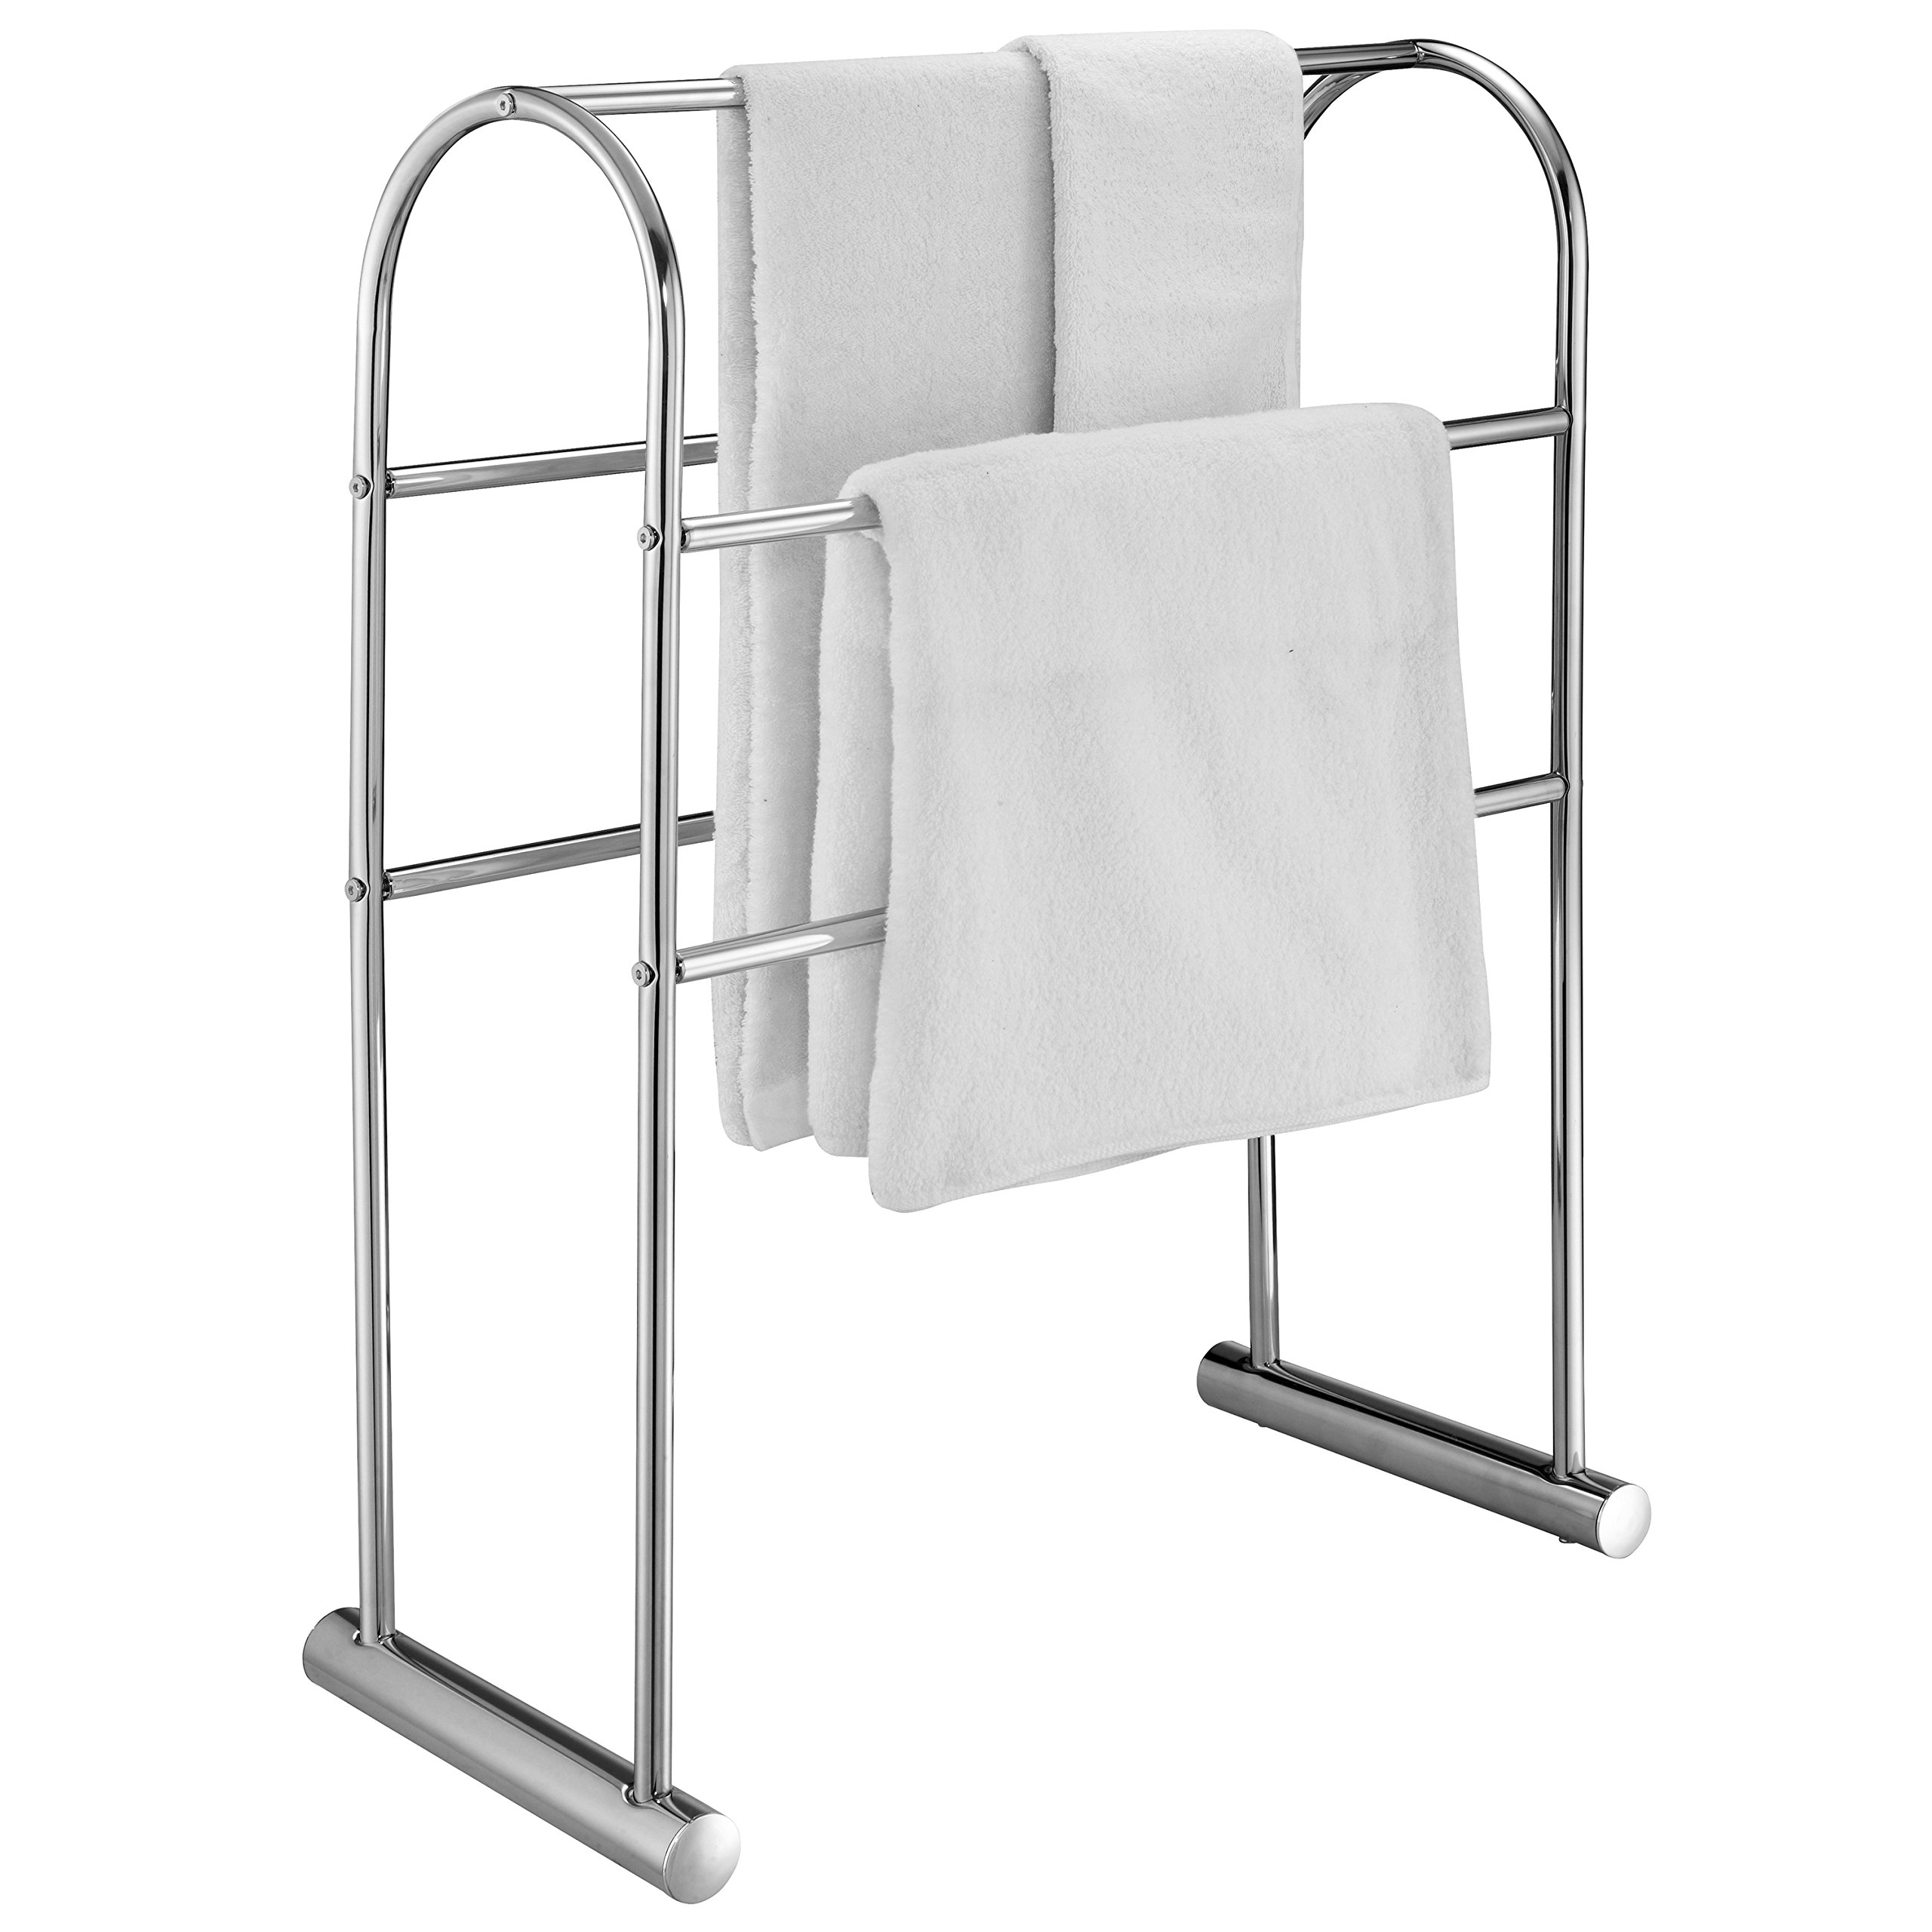 Chrome-Plated 5 Bar Towel Stand Organizer, 32-Inch Freestanding Bath Drying Rack